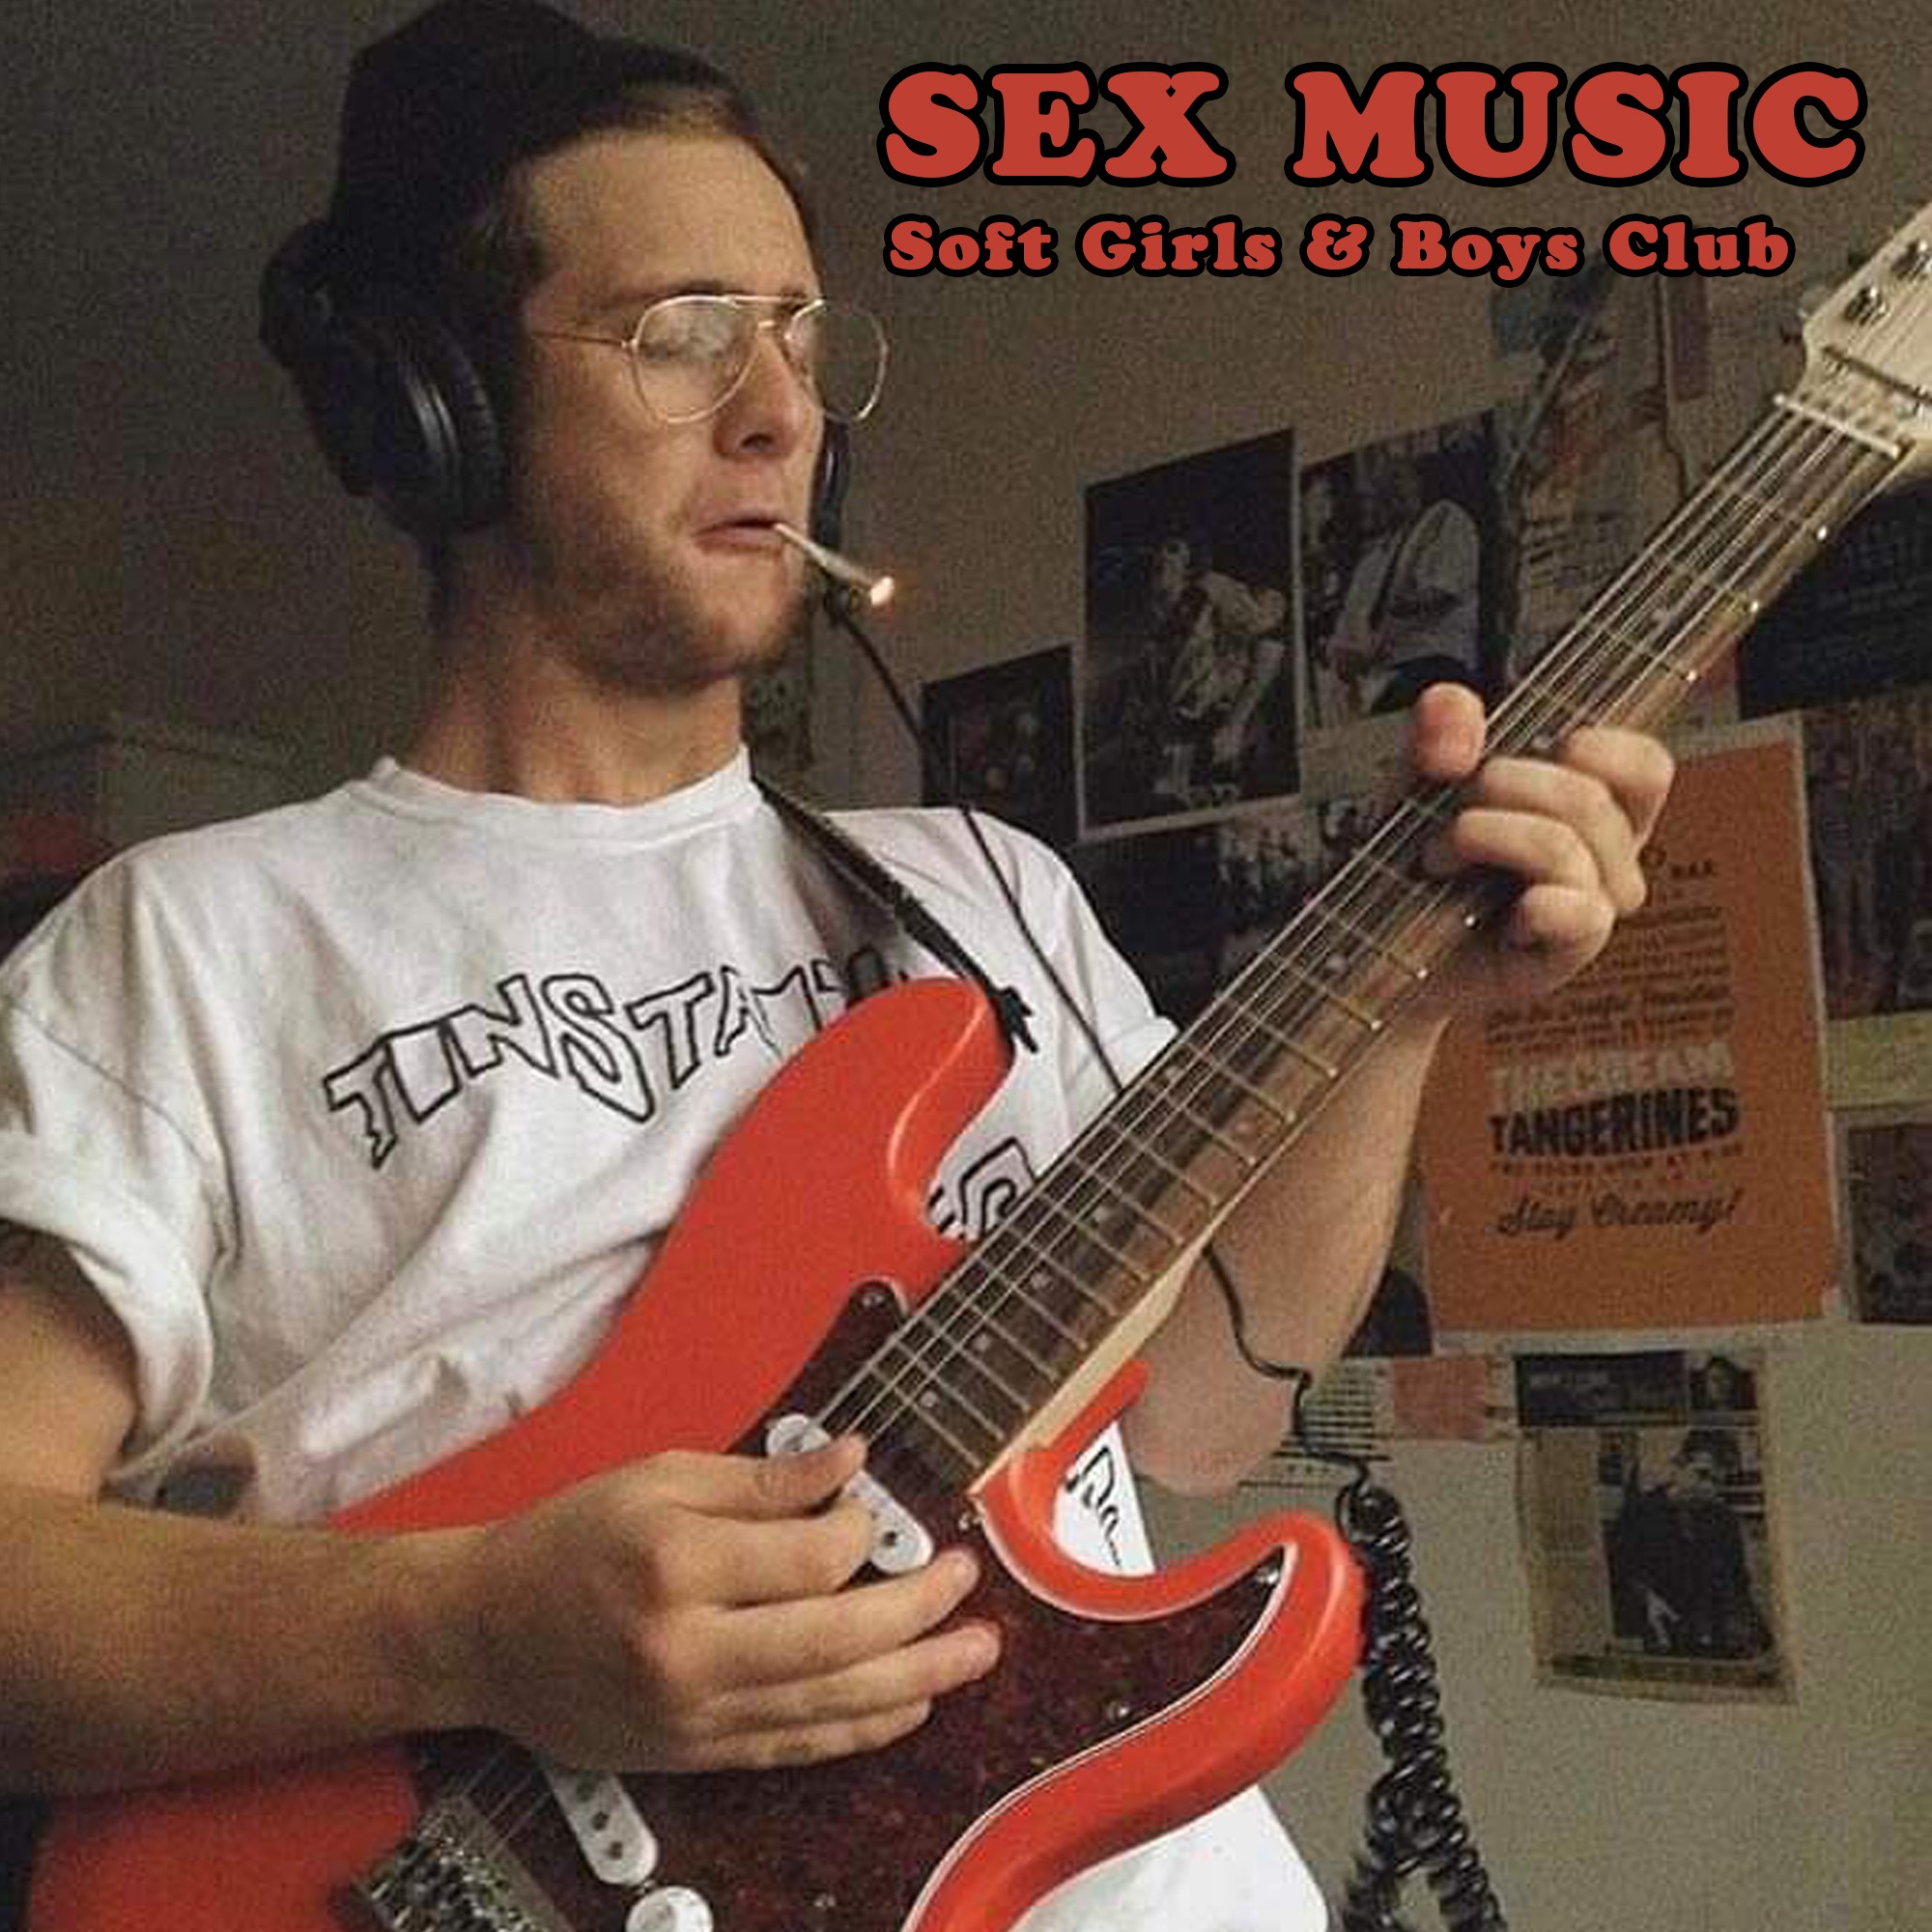 PLX037 • Soft Girls & Boys Club • Sex Music